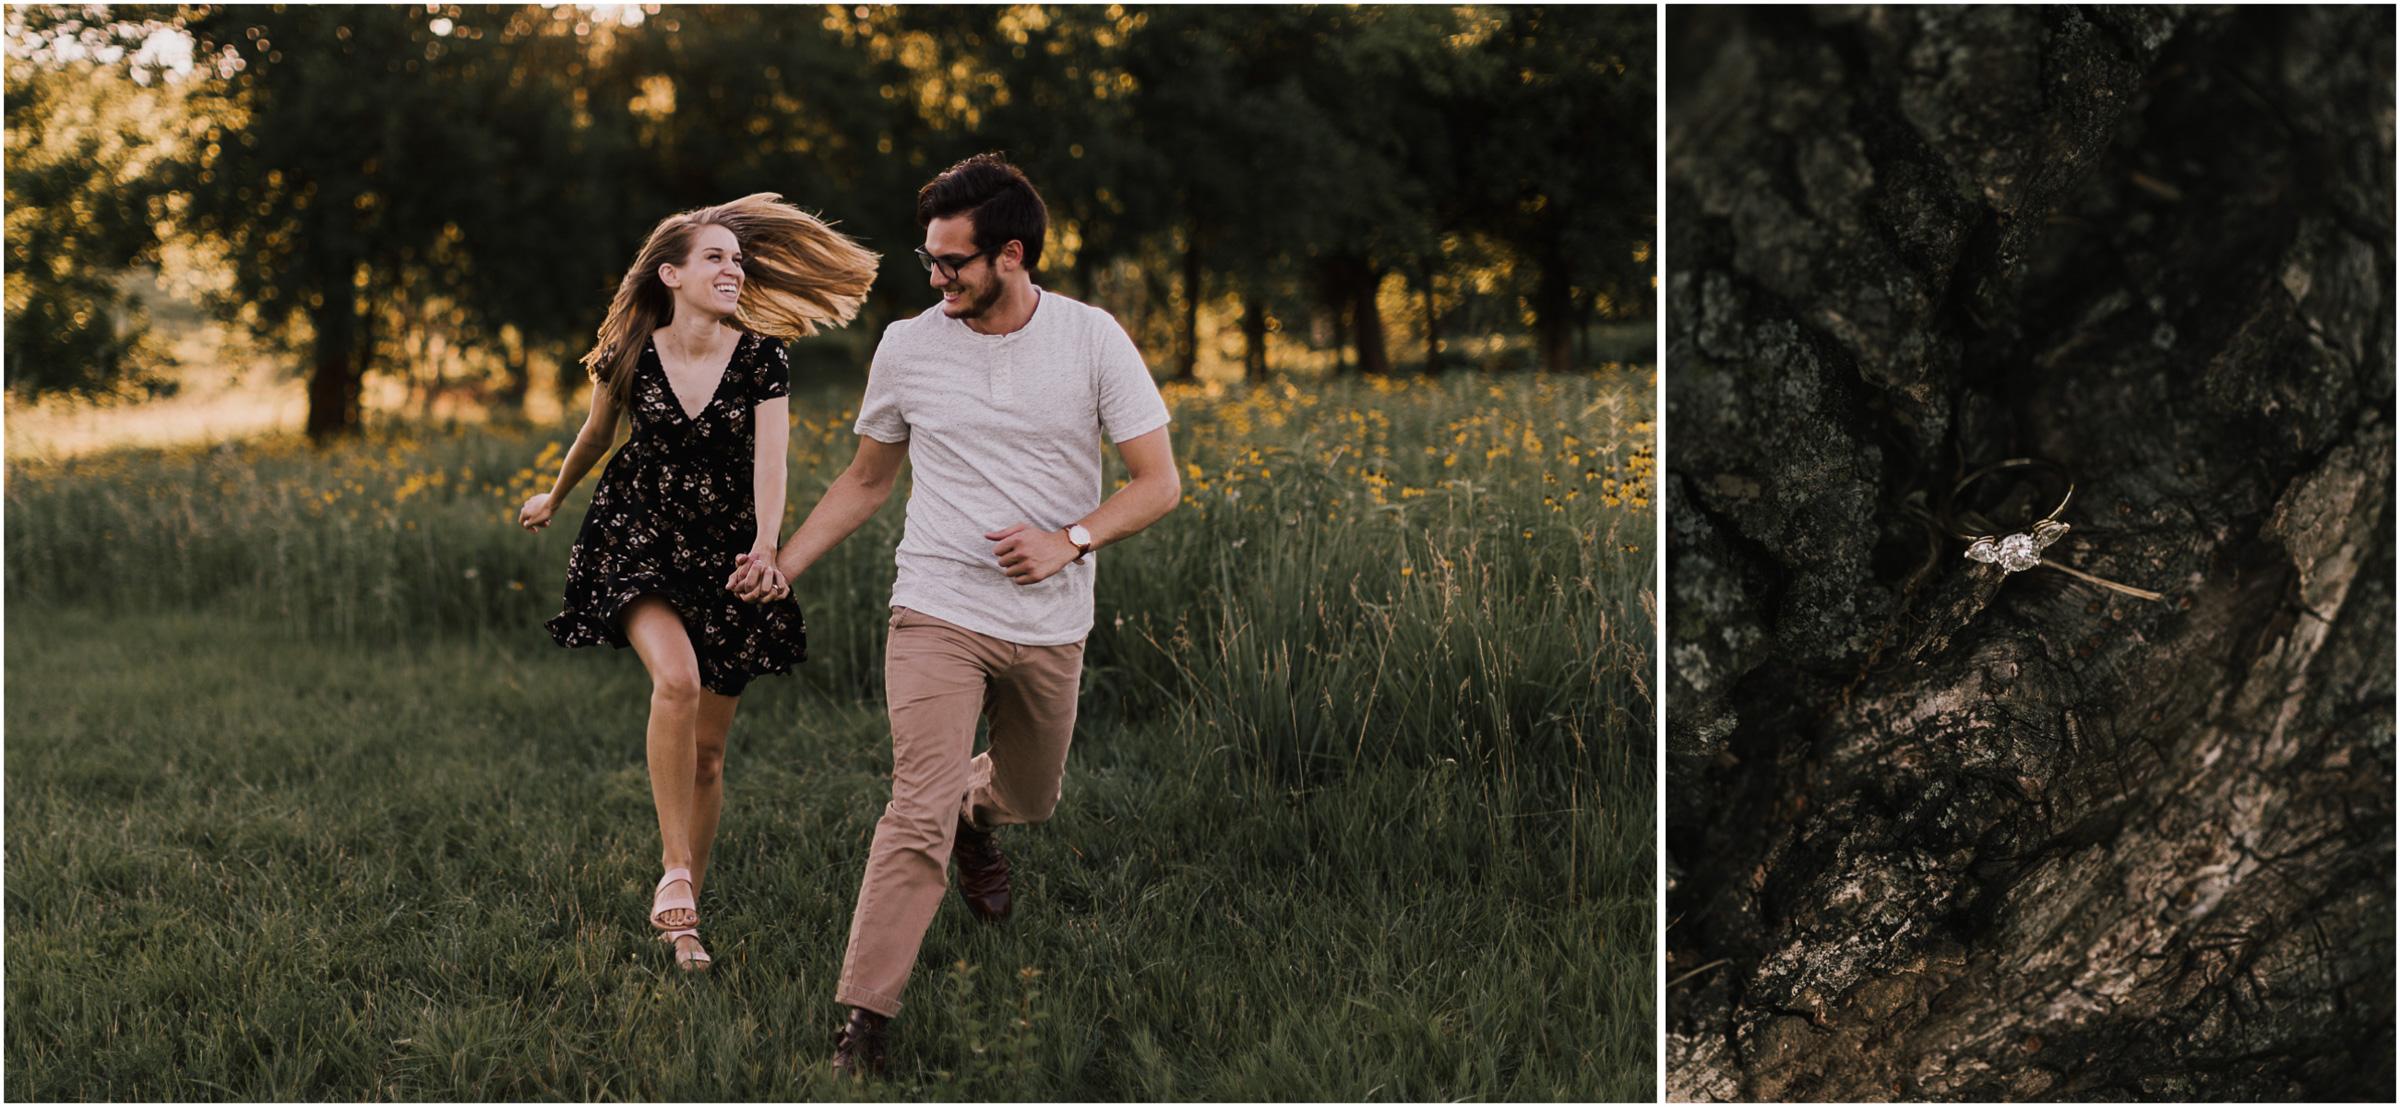 alyssa barletter photography shawnee mission park engagement session photographer summer flower fields-3.jpg